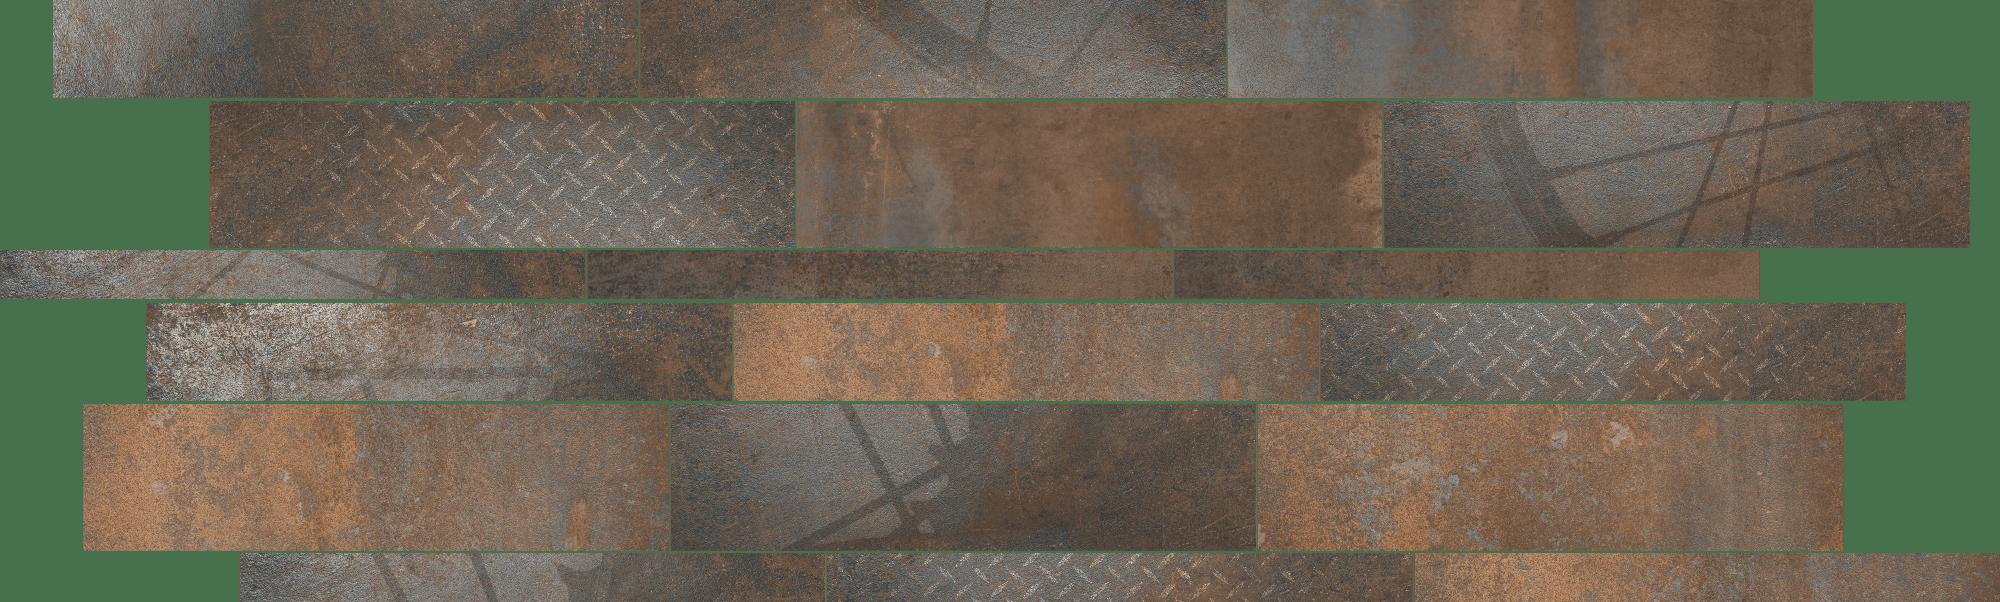 OXID MIX rust Format Mix Image